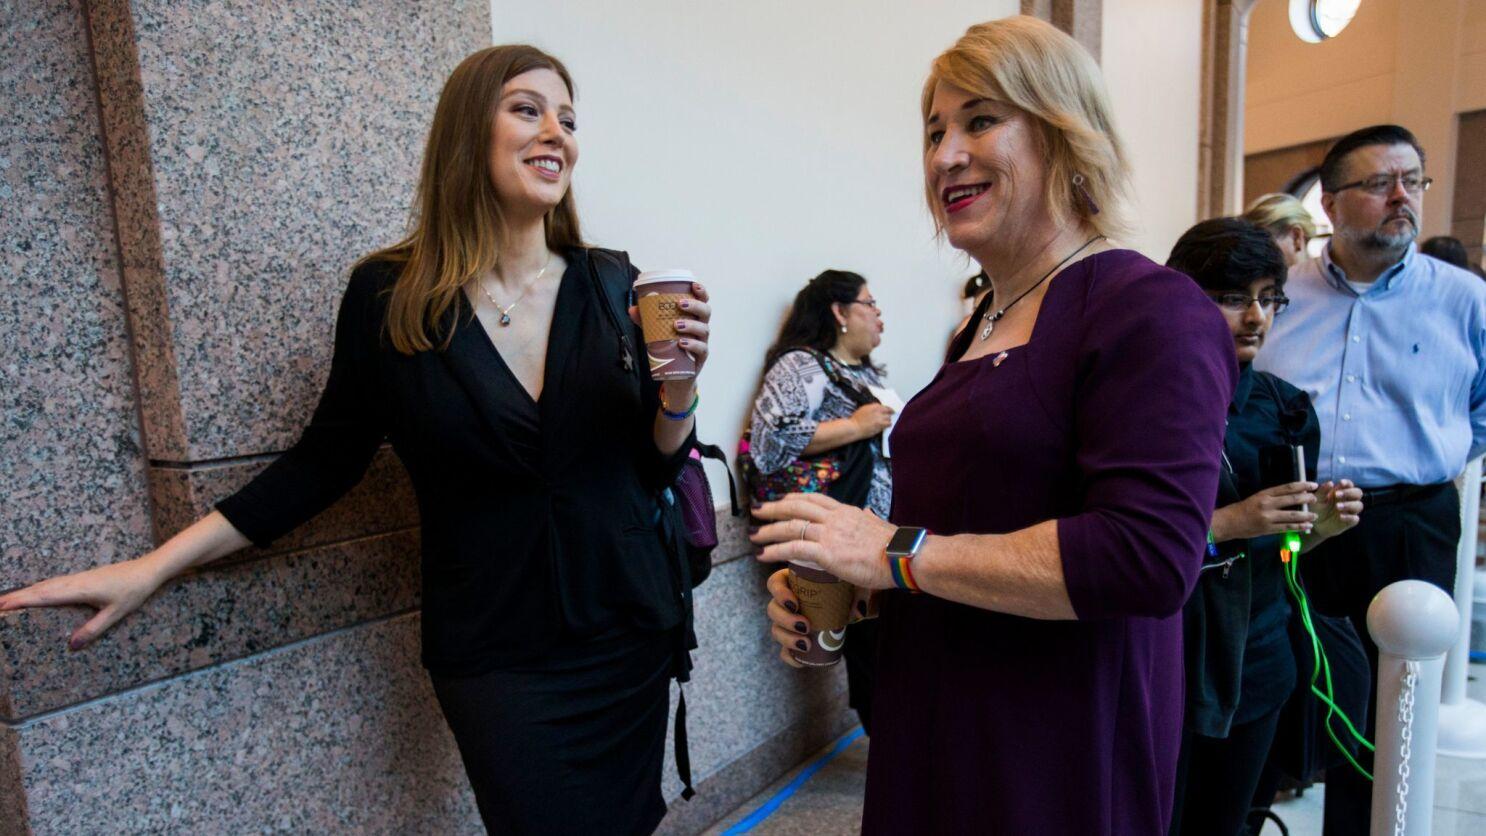 Texas Bathroom Bill Debate Shows A Widening Gap Between Liberal